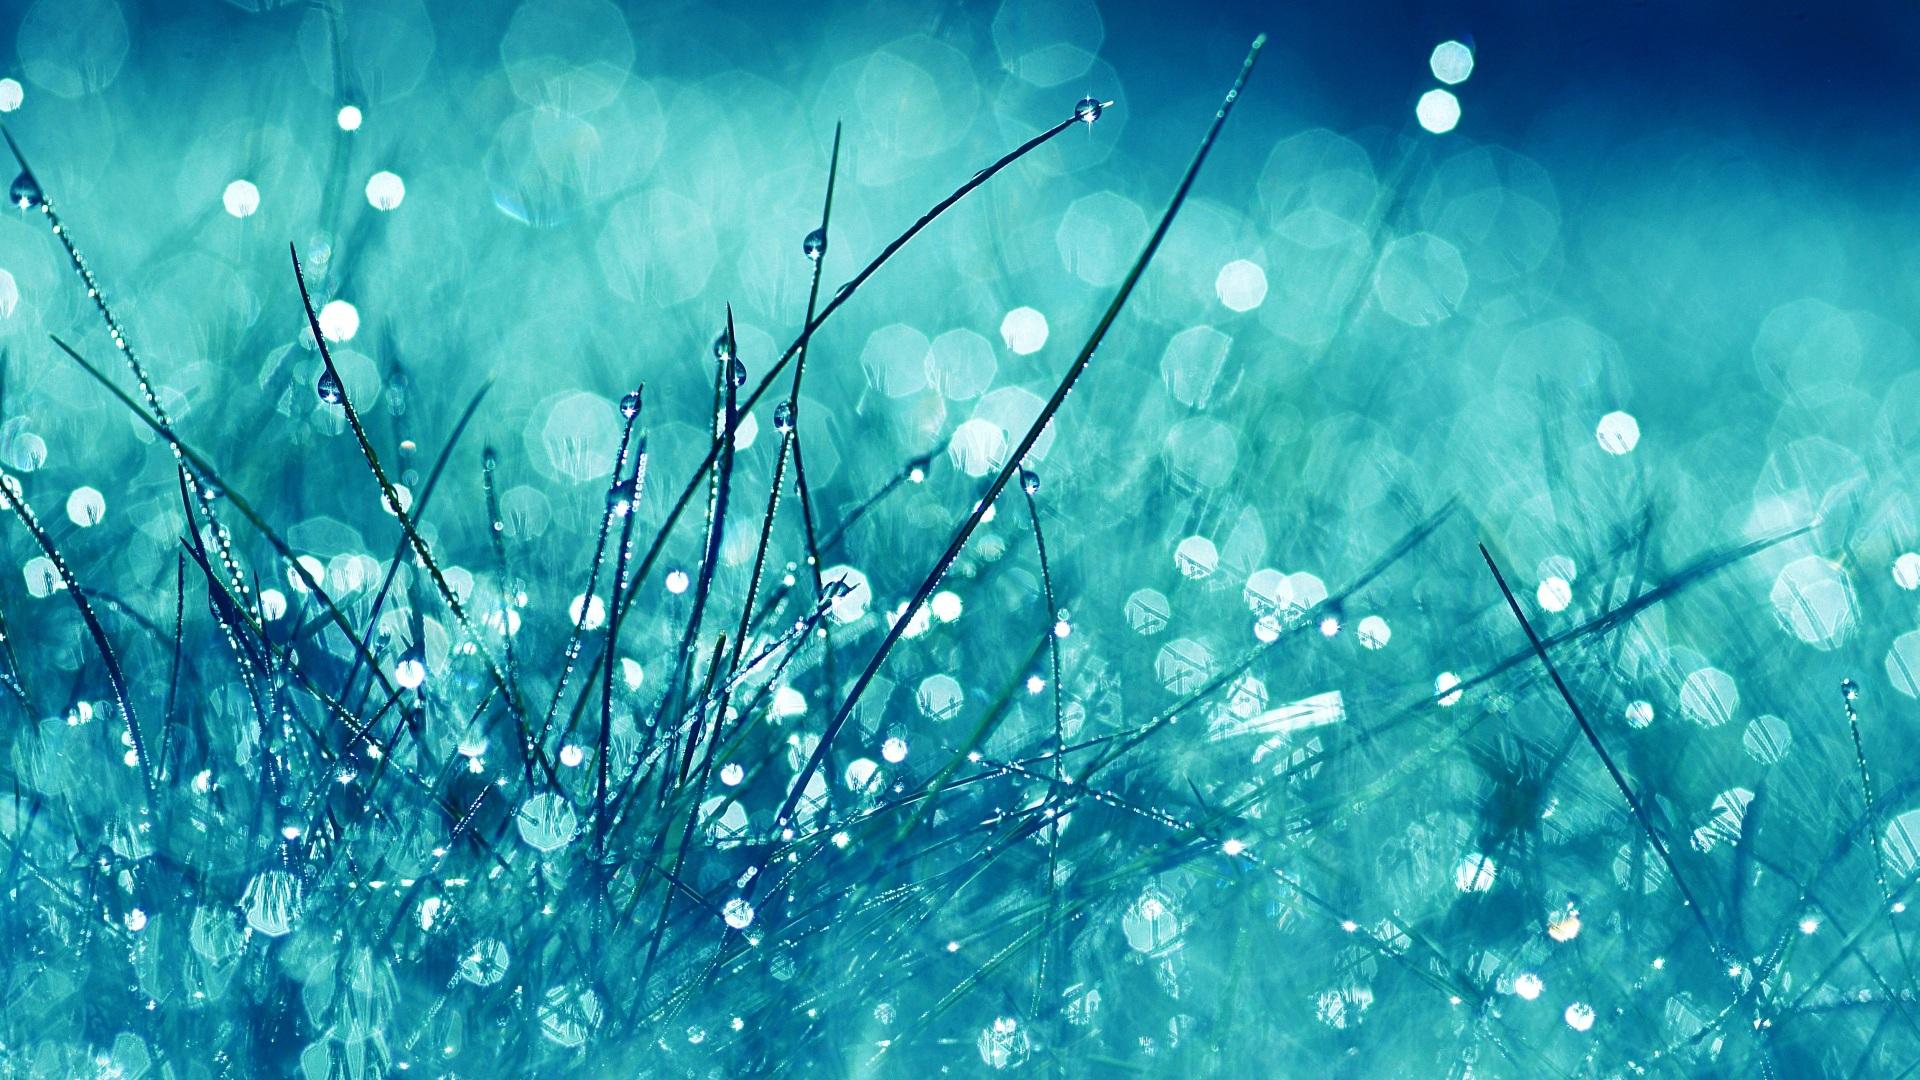 Fresh Wallpapers PC Fresh Amazing Wallpapers LLGL 1920x1080